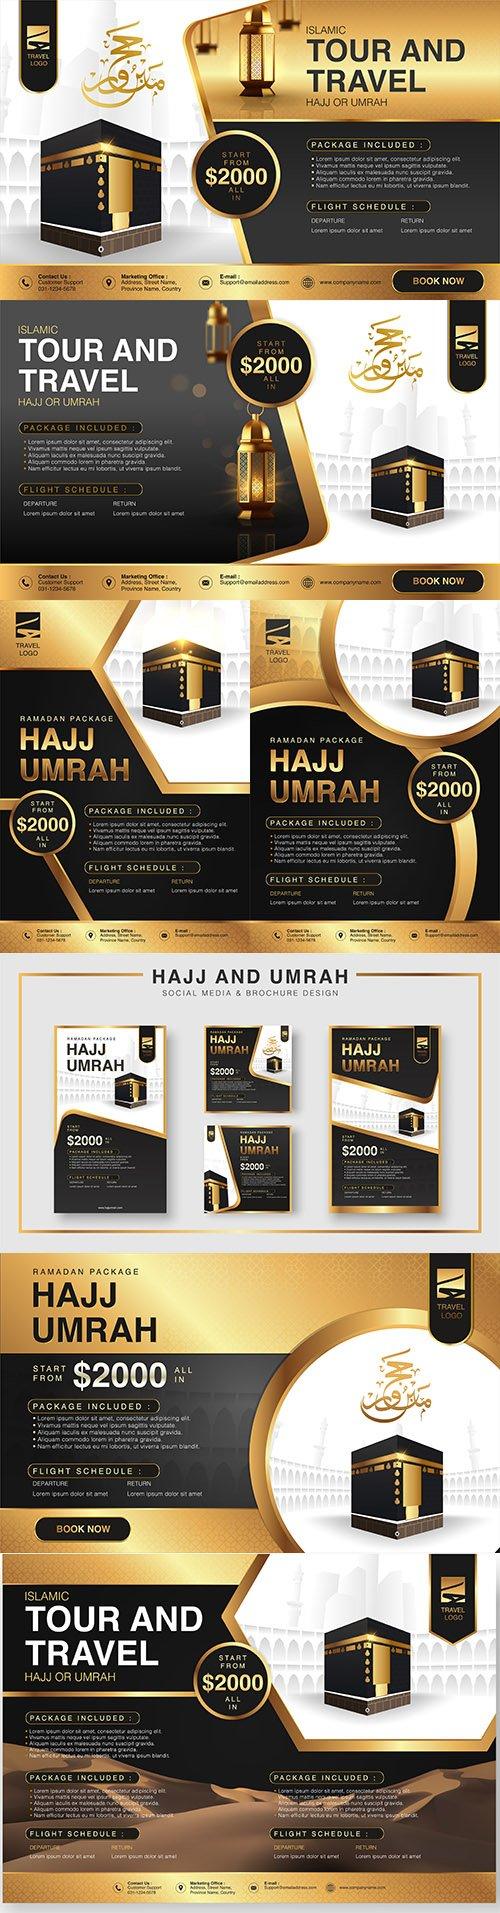 Islamic Ramadan Hajj and Umtra brochure design illustration